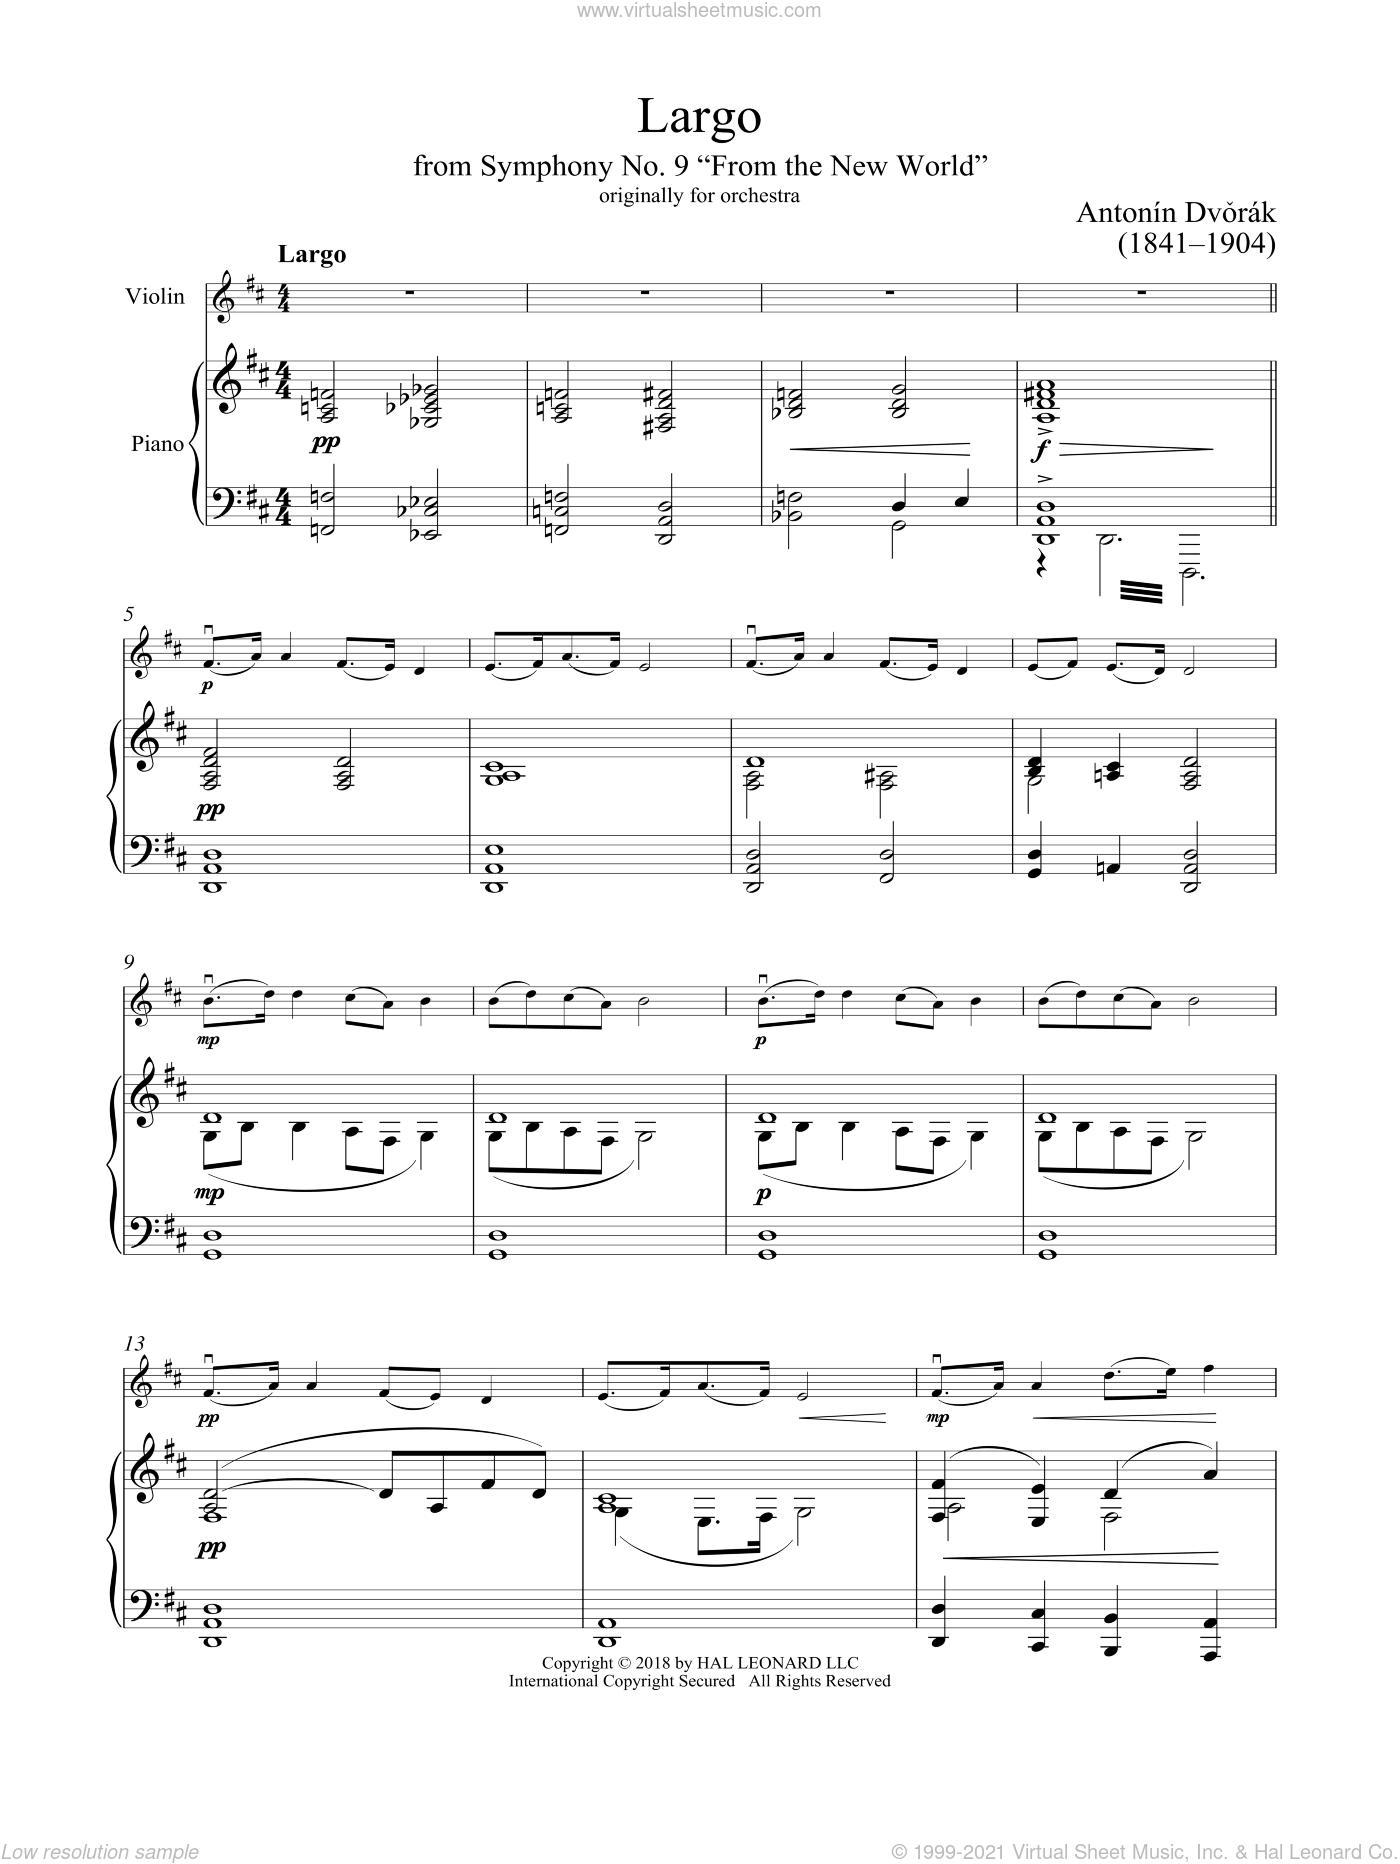 Largo From Symphony No. 9 ('New World') sheet music for violin and piano by Antonin Dvorak, classical score, intermediate skill level